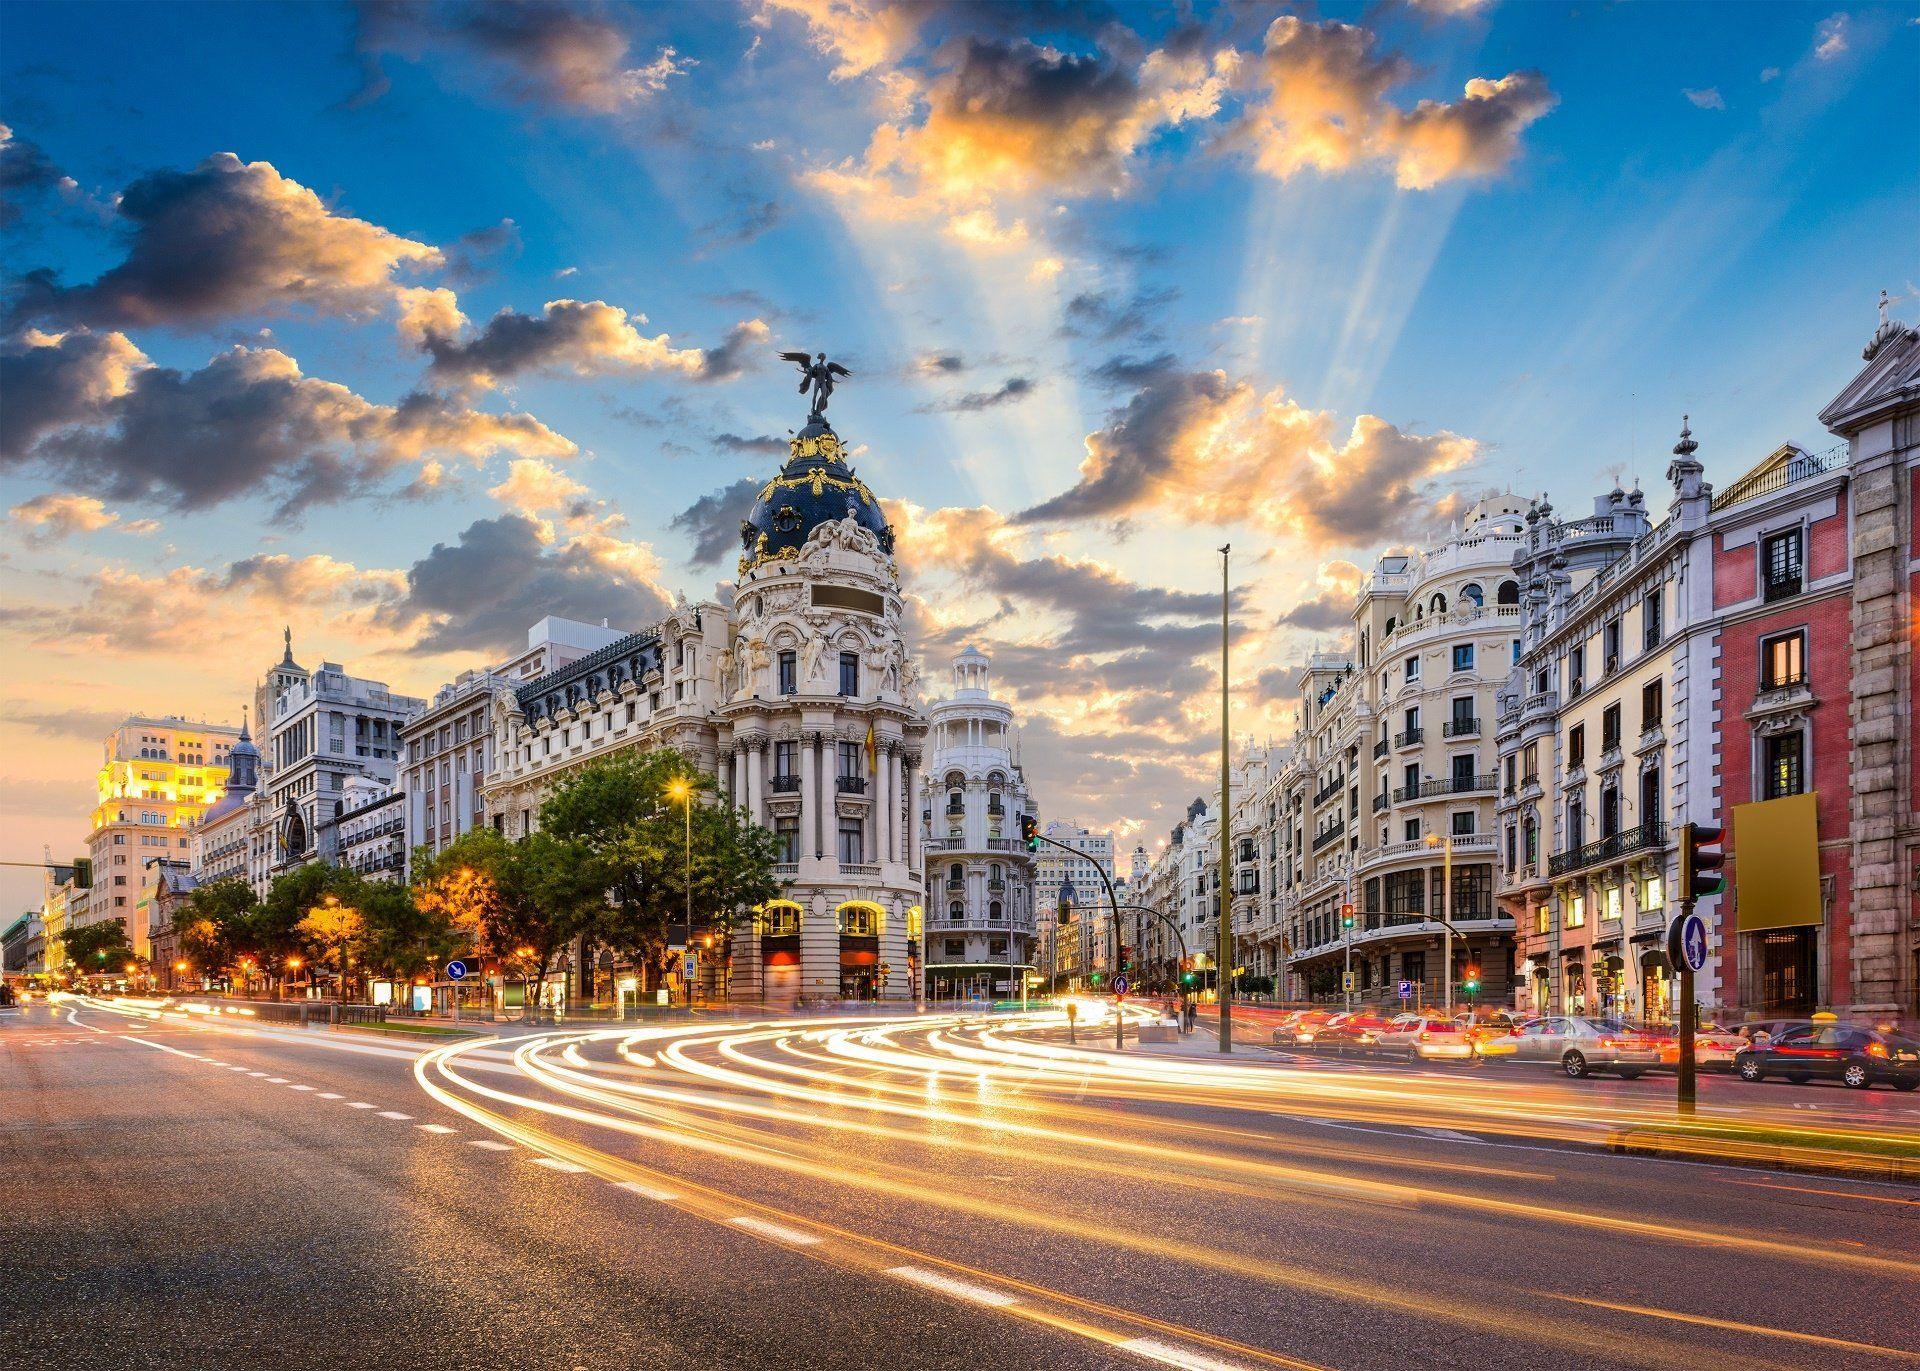 Wallpaper de Madrid